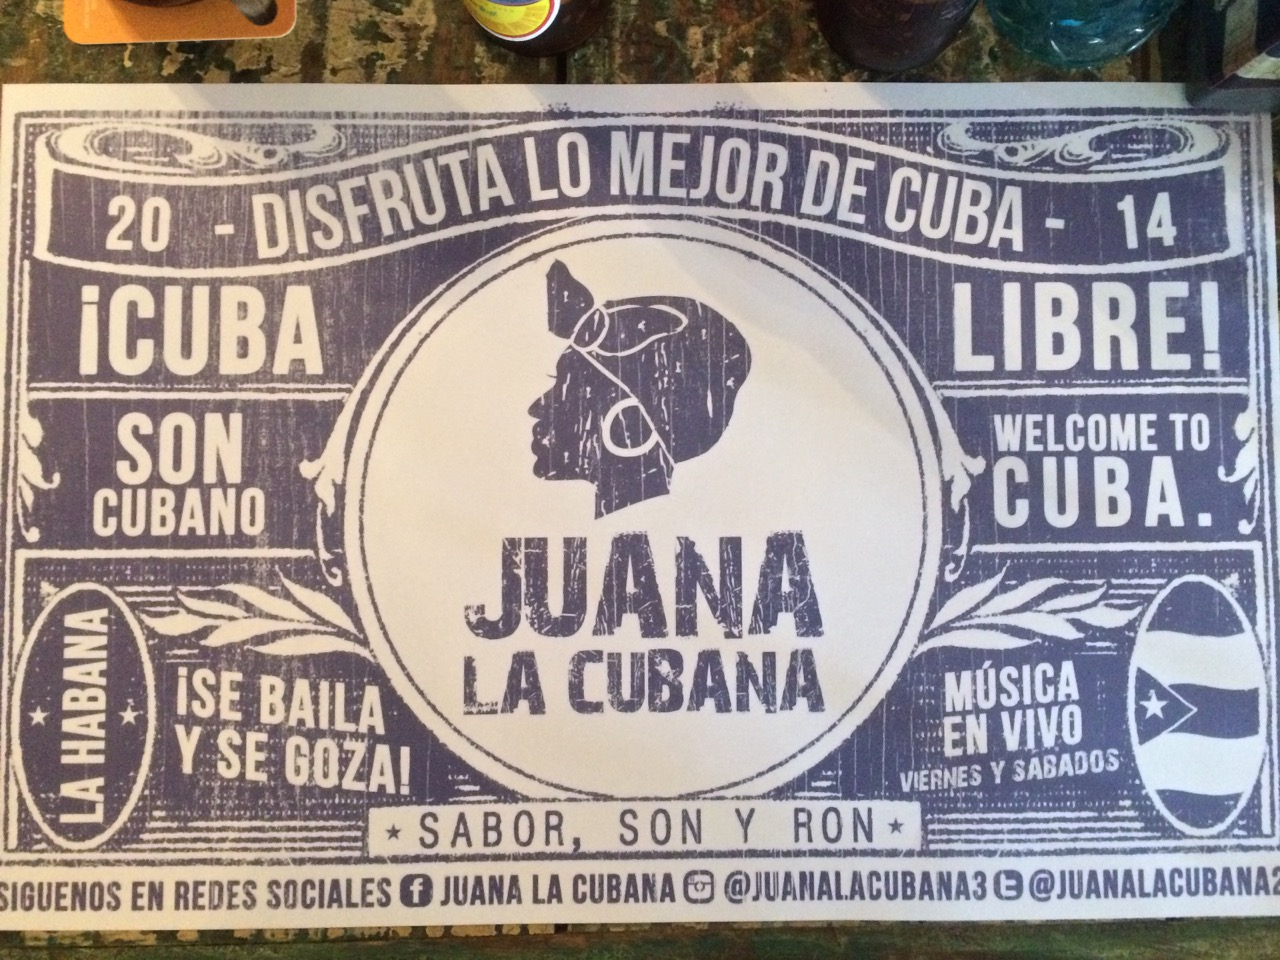 Juana La Cubana for your enjoyment